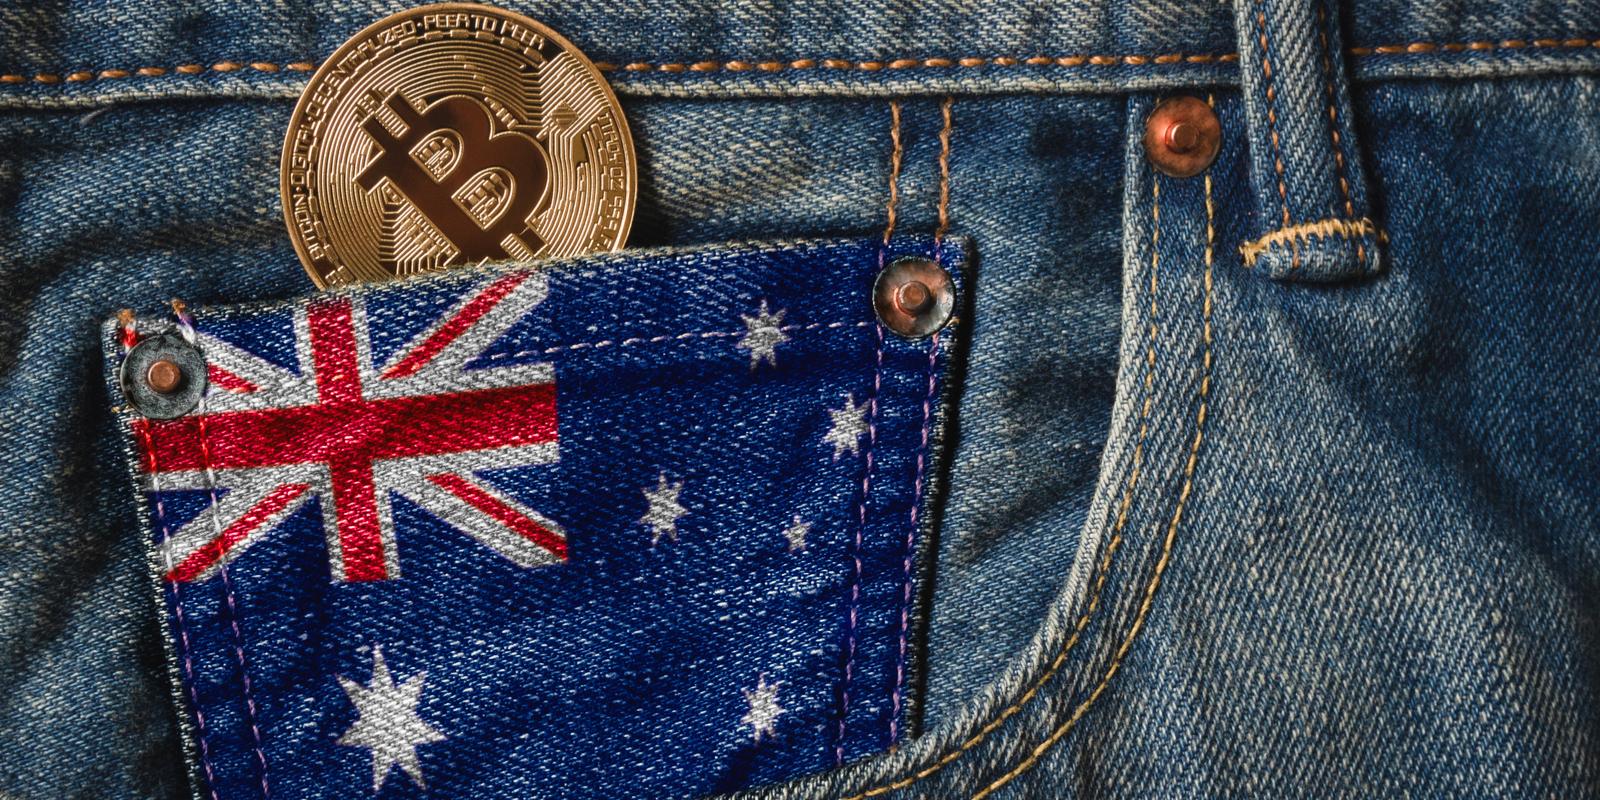 Aussie Banks Still Cold to Cryptocurrency Businesses Despite Regulation